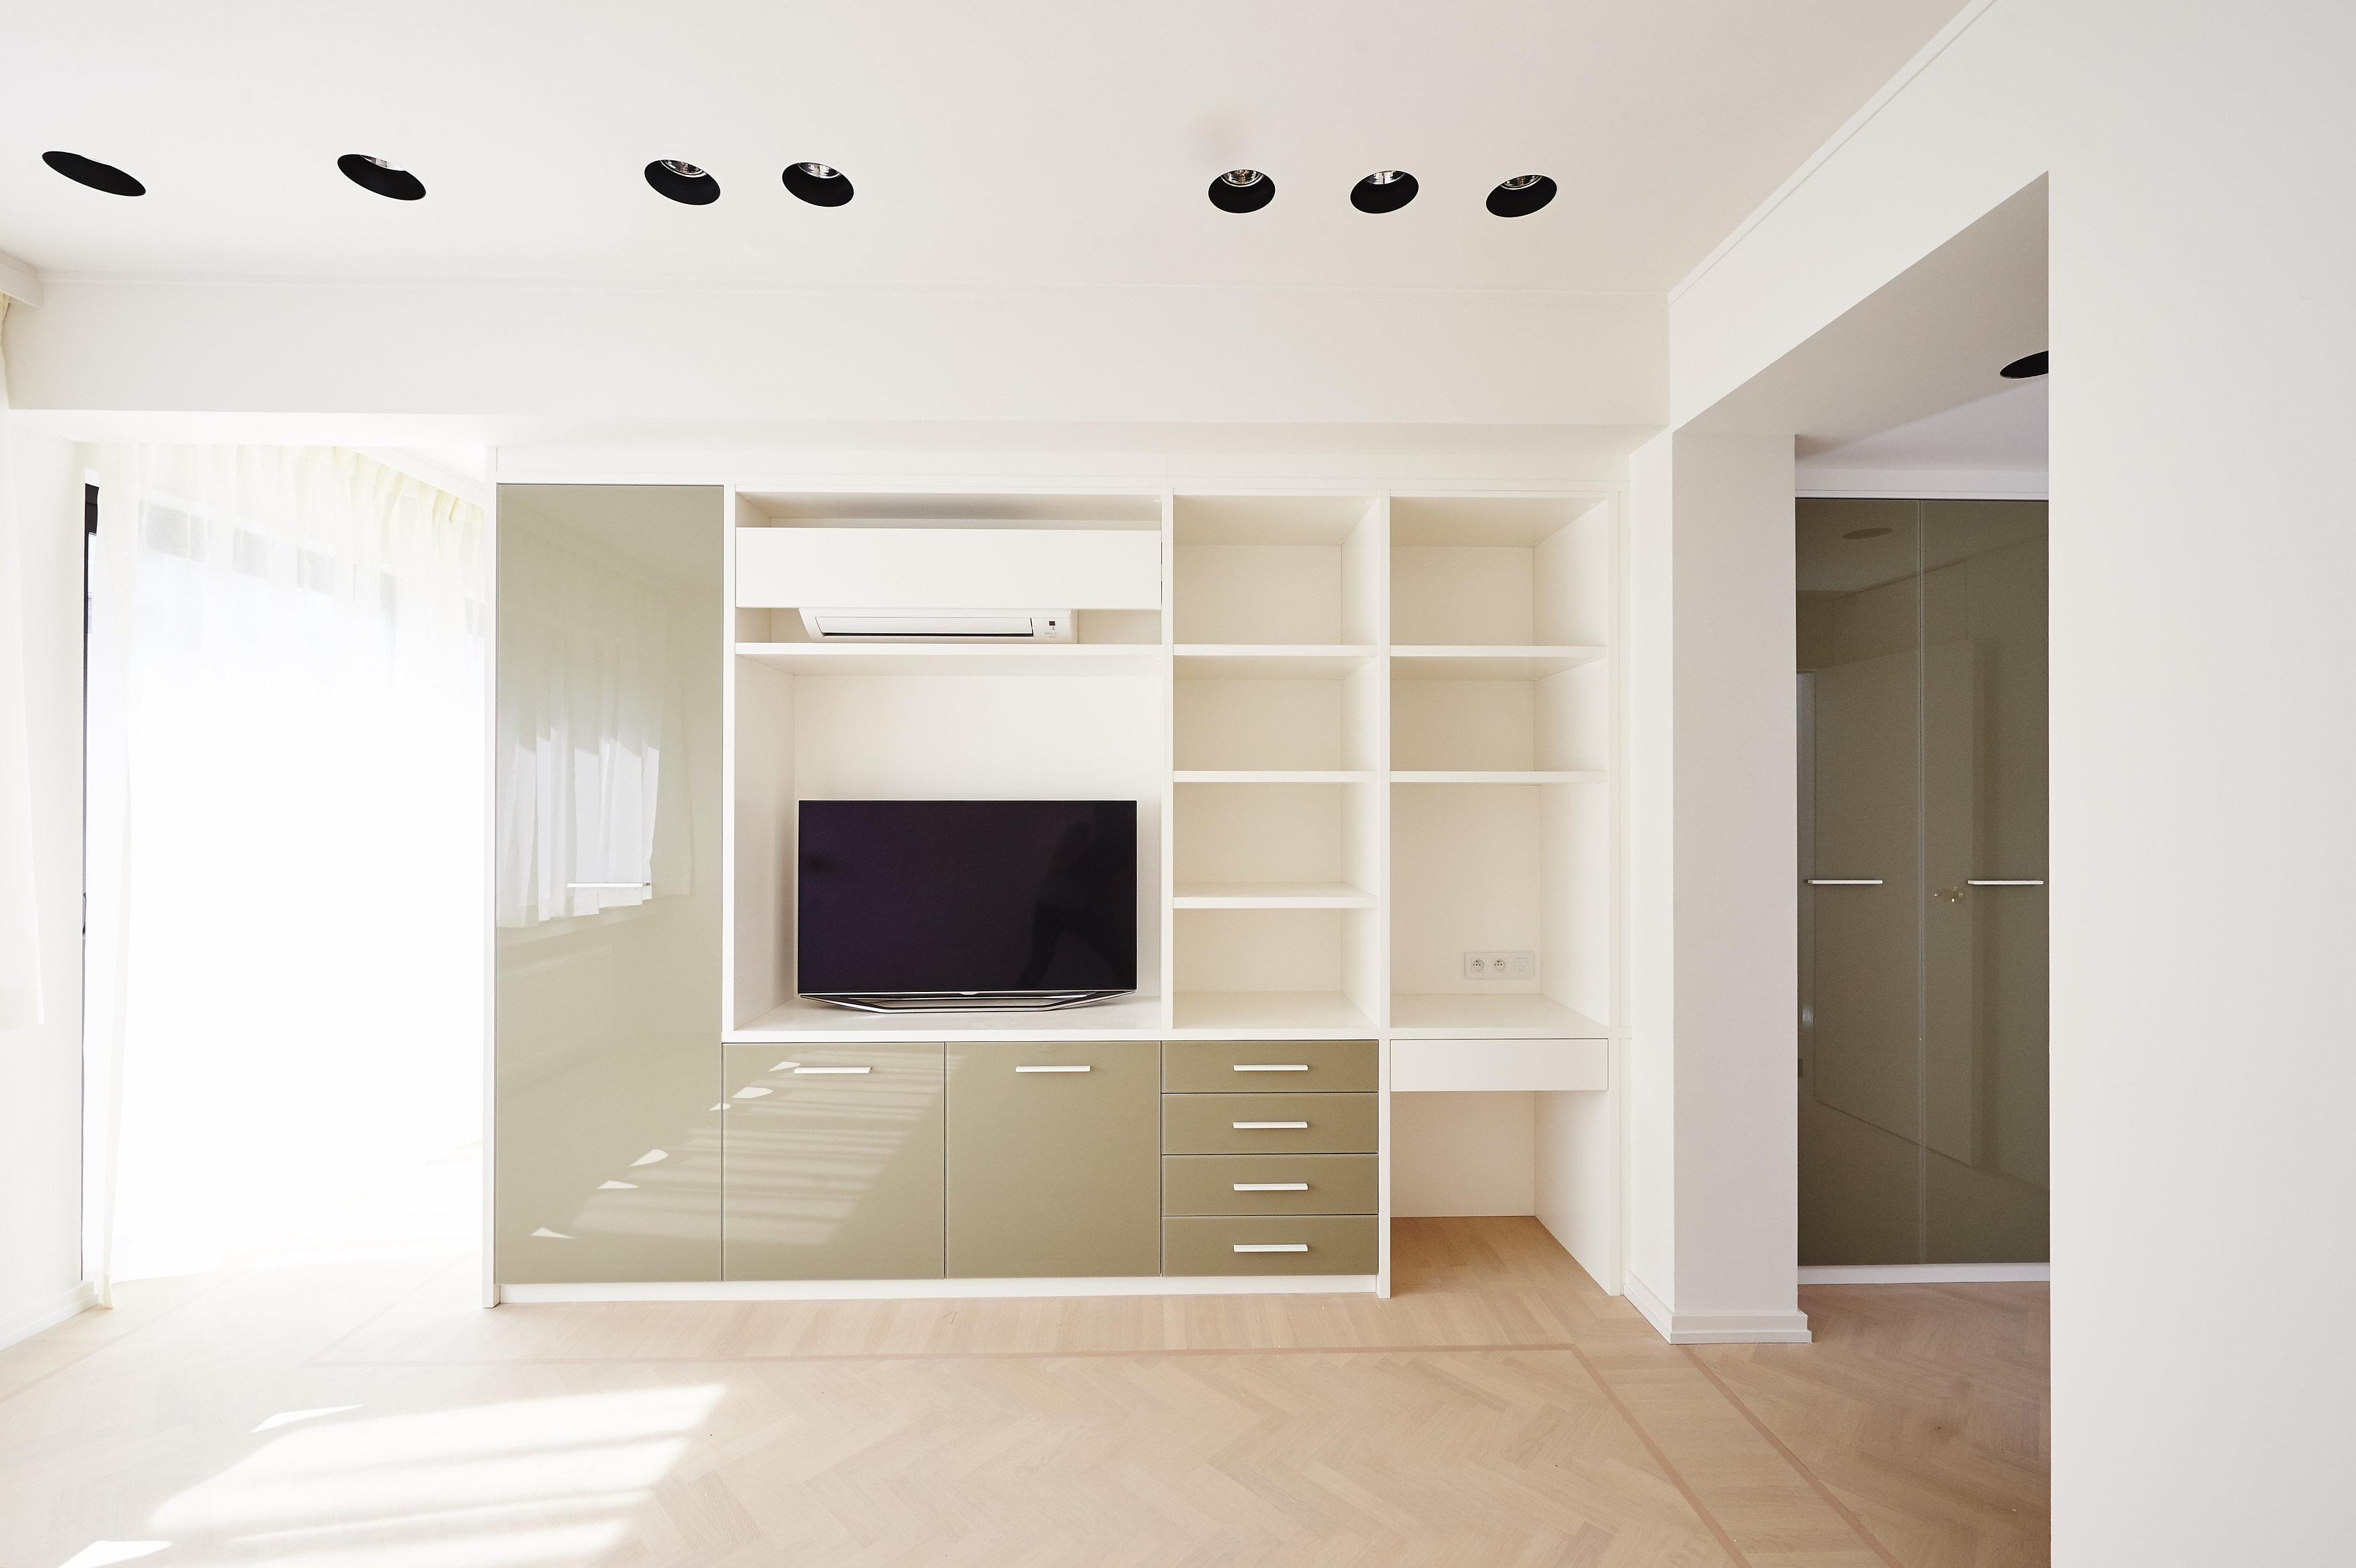 Tv meubel hedendaags camber 559fd03257a57.jpeg